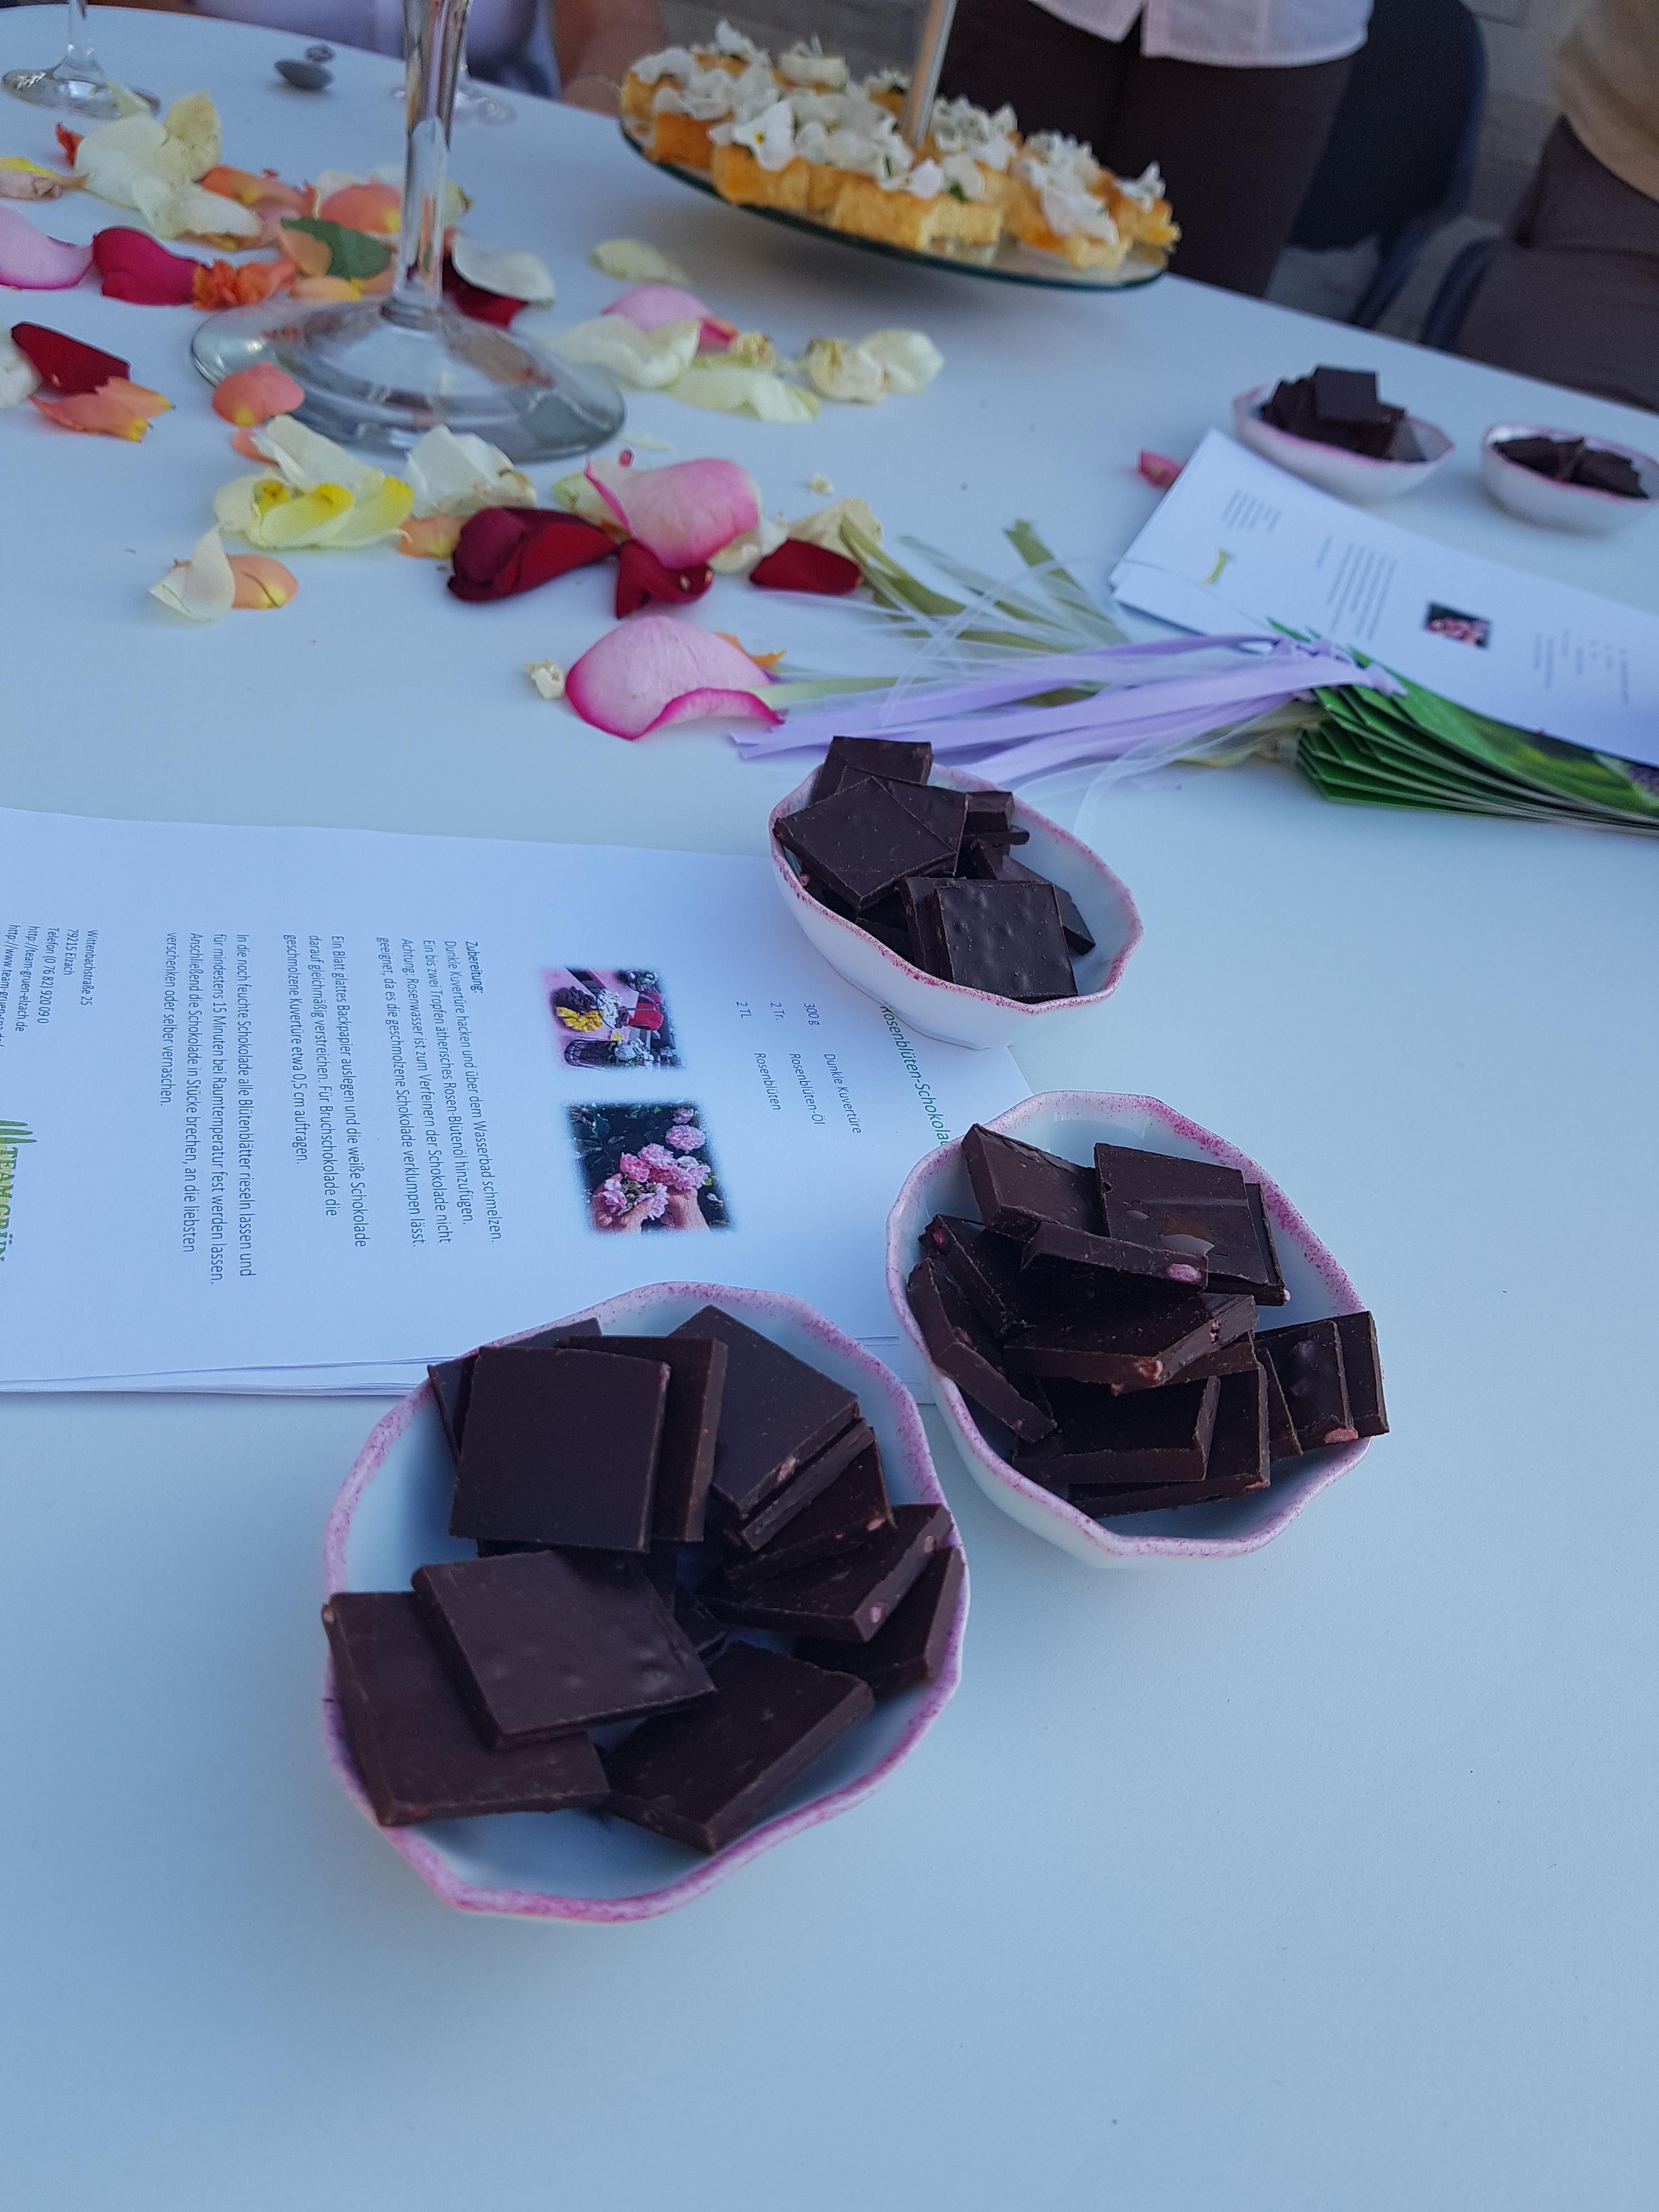 Rosenblüten-Schokolade